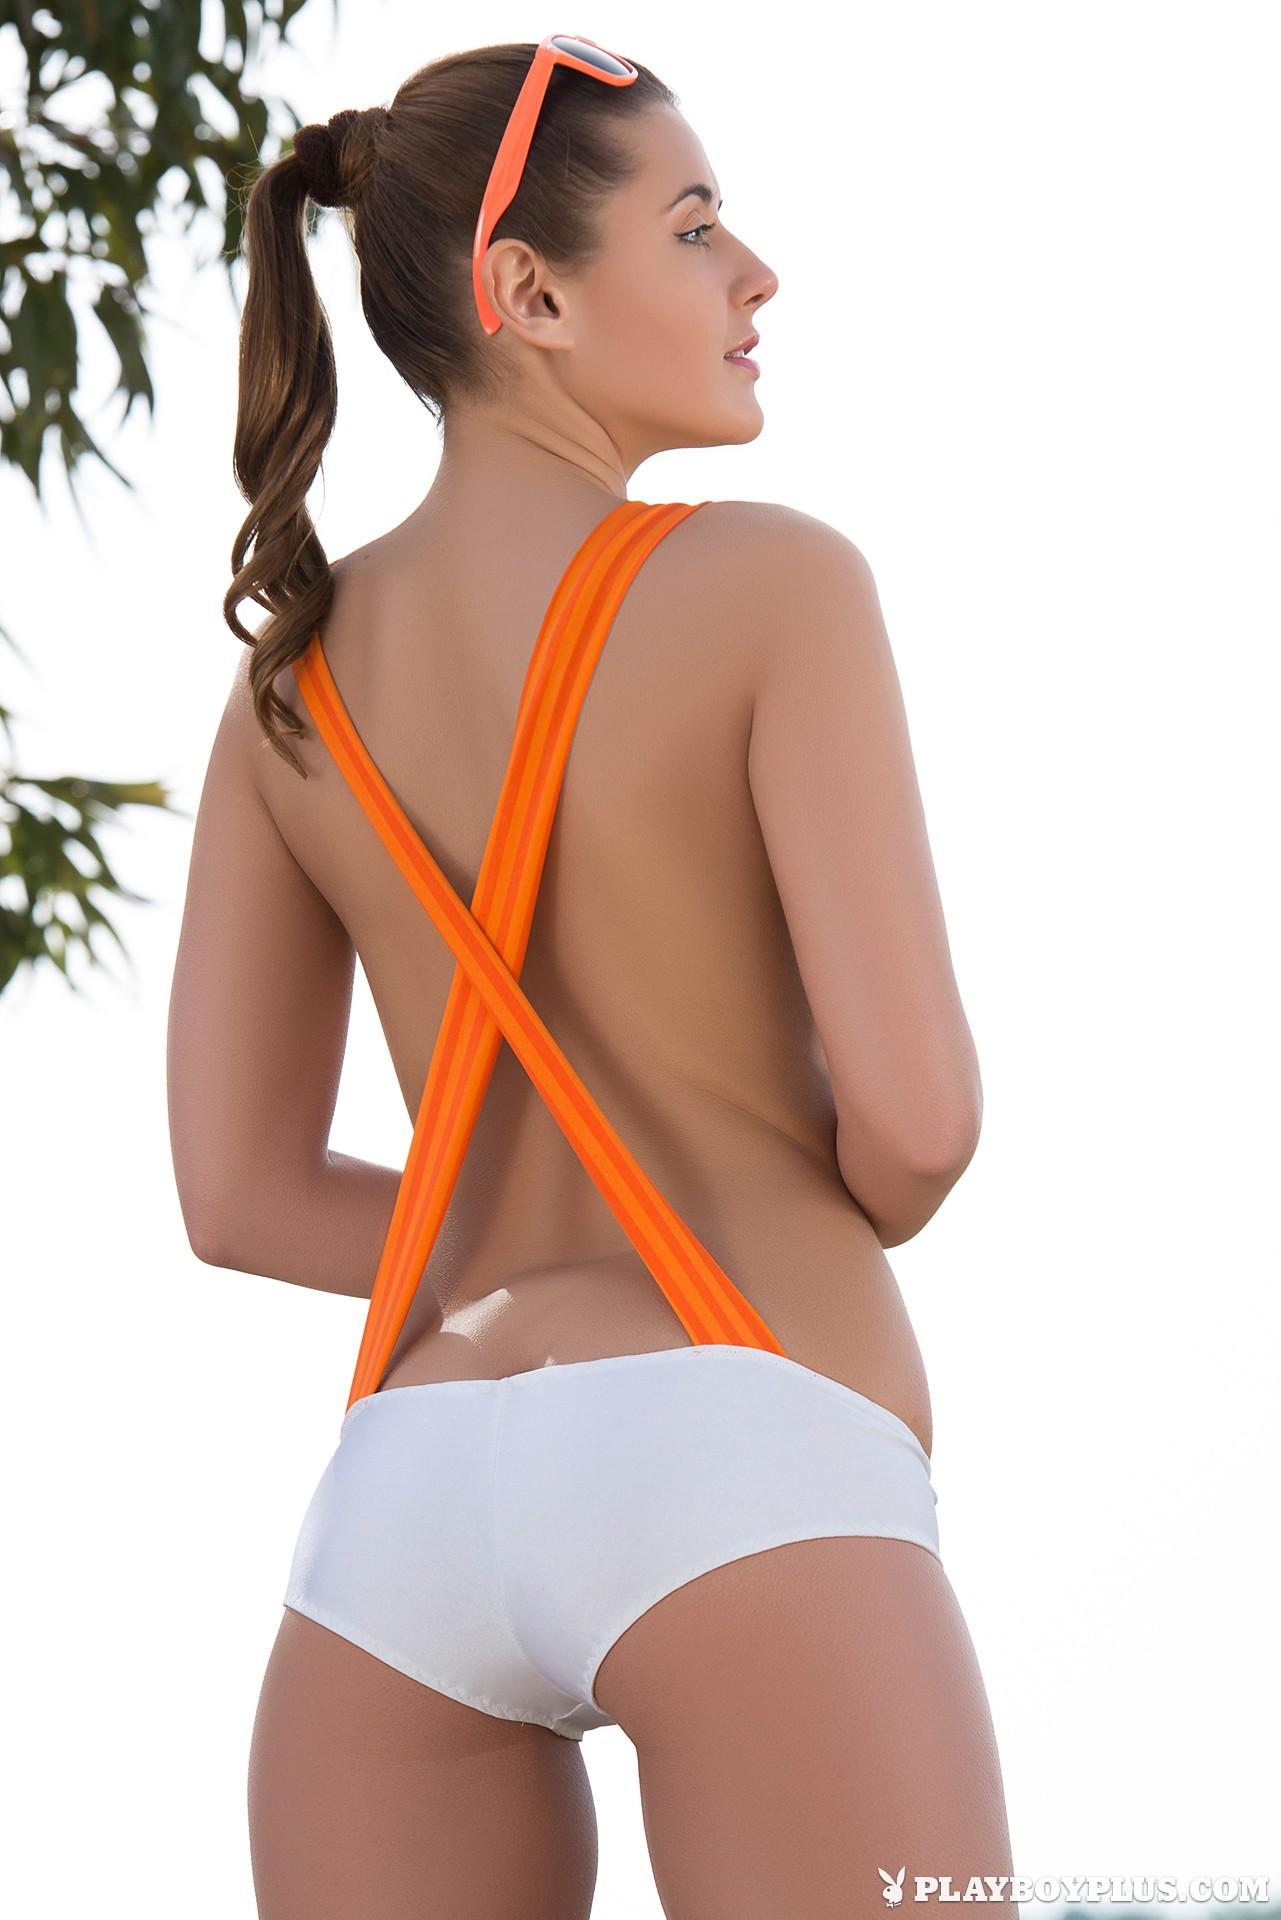 People 1281x1920 Kailena Sybil A white cotton panties Playboy Playboy Plus Playmate Davina E.